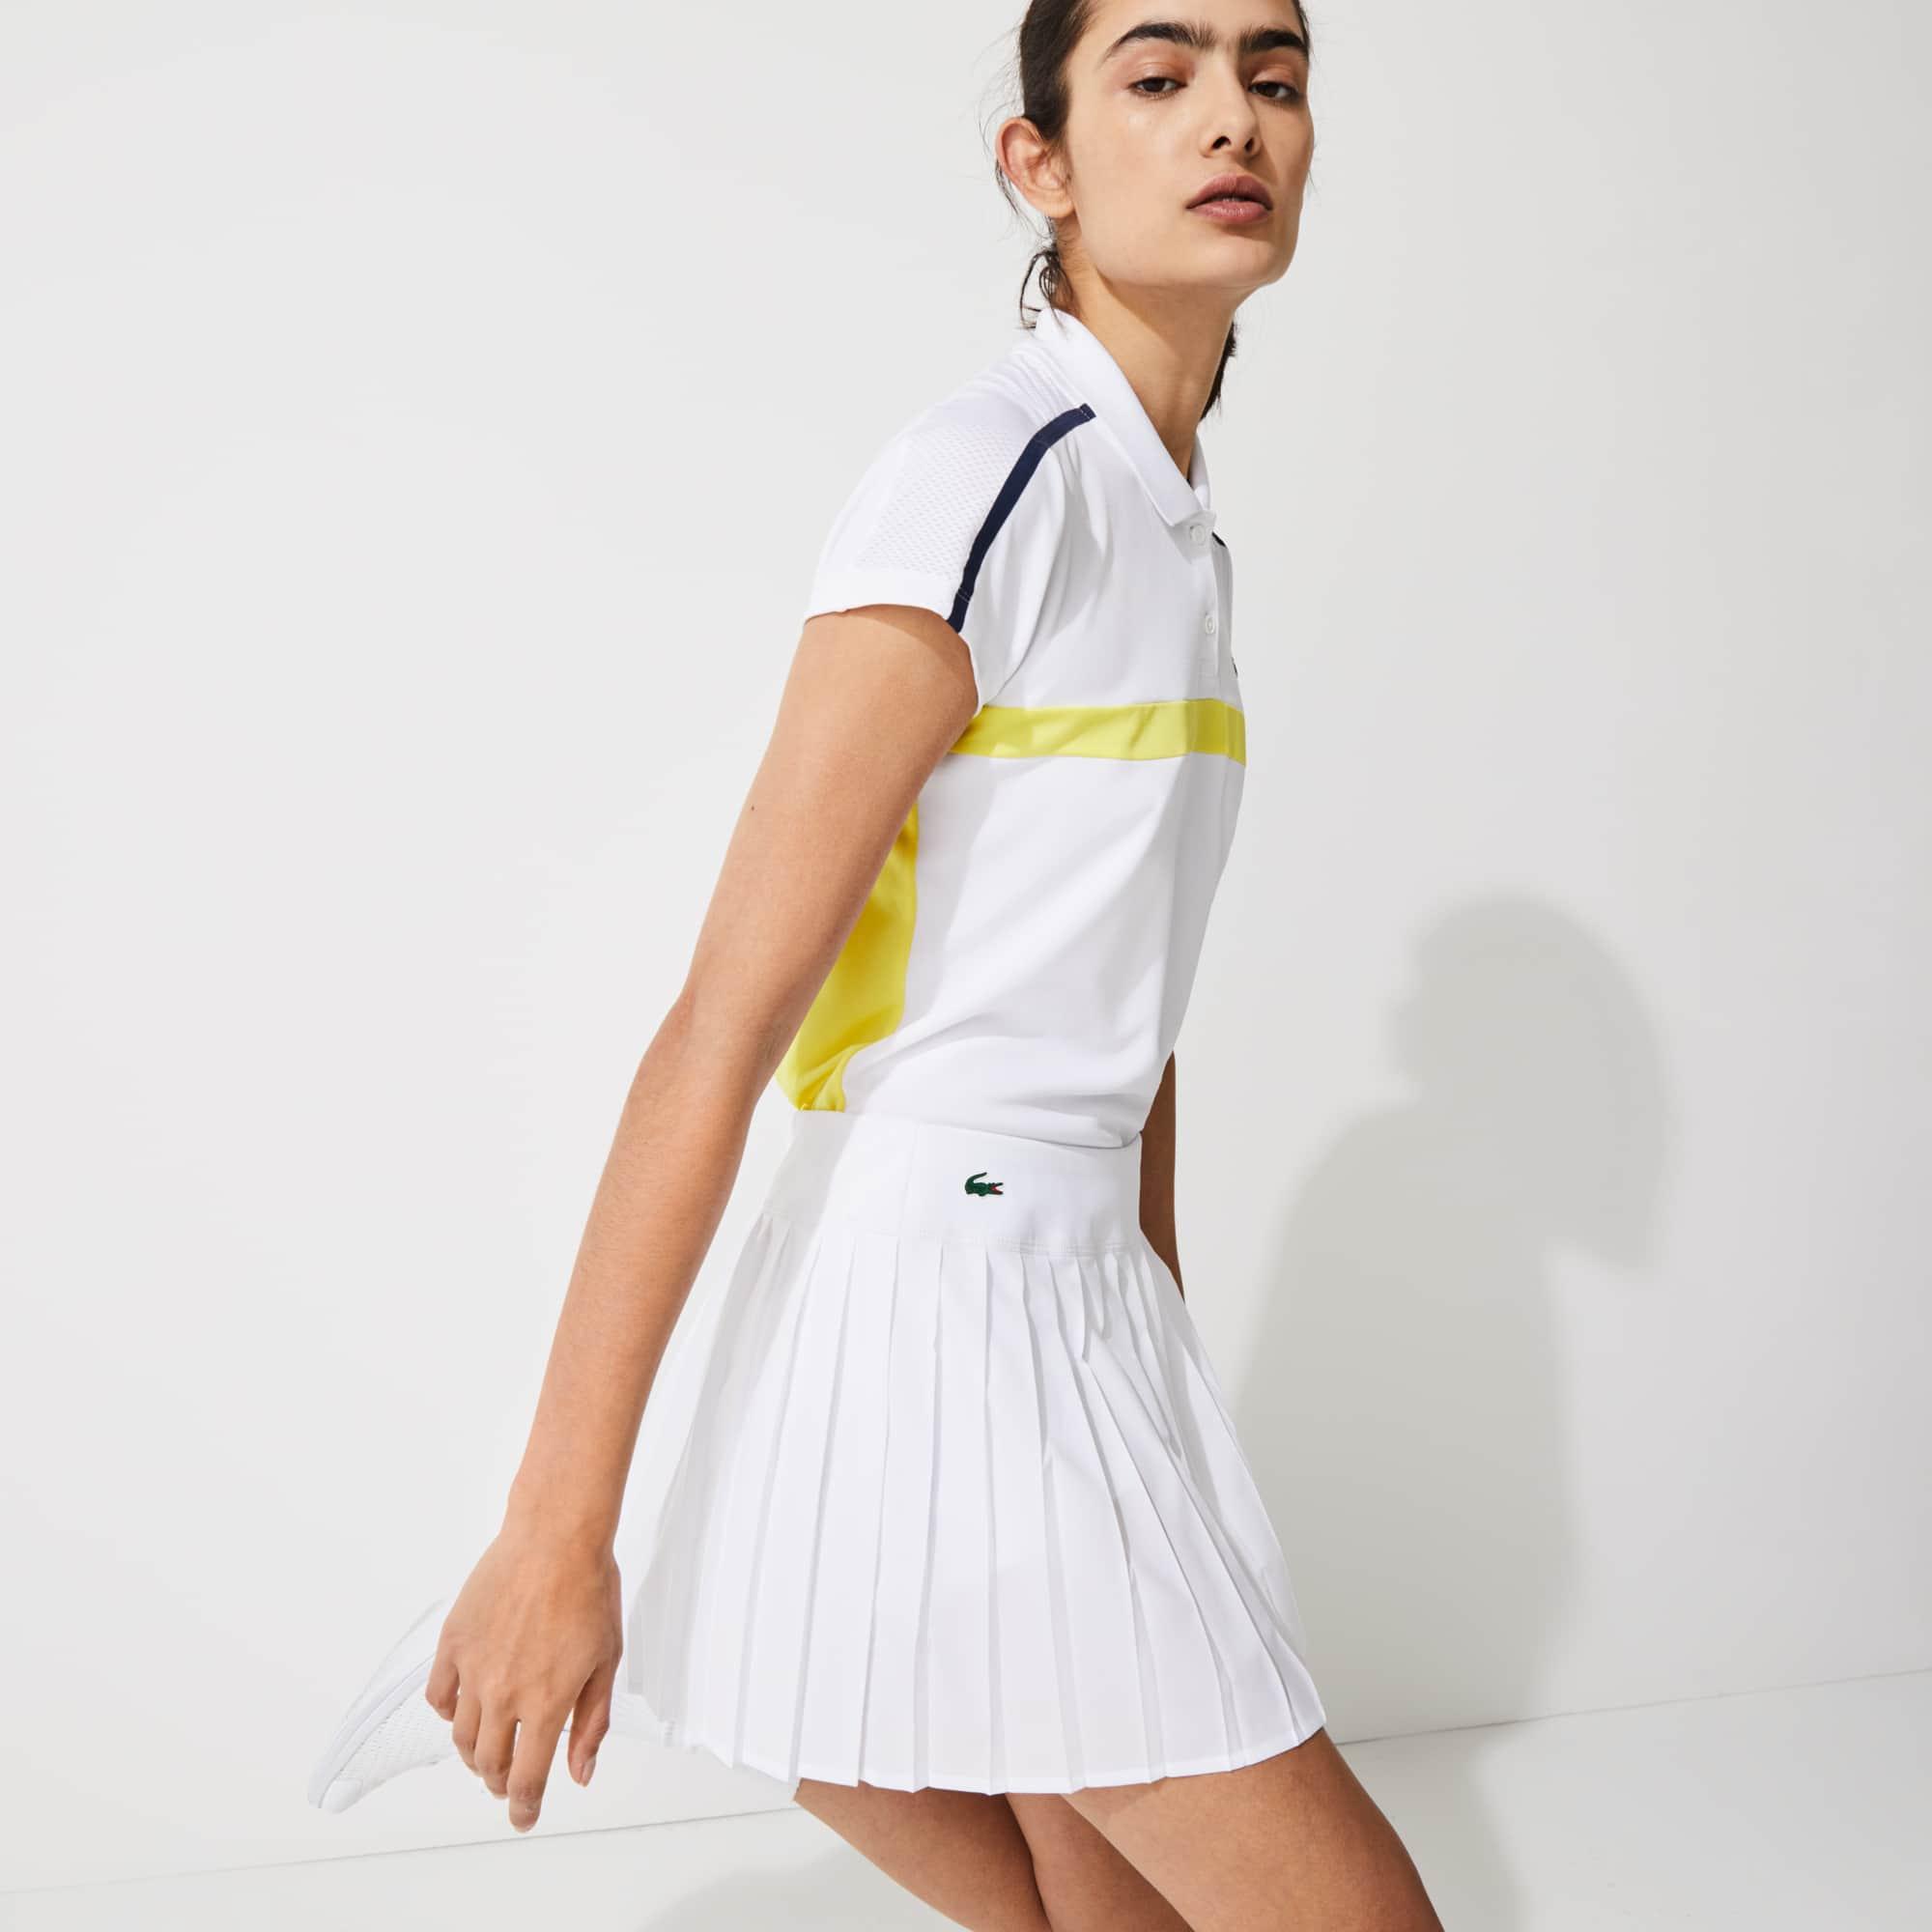 Lacoste Women's SPORT Ultra Dry Pleated Tennis Skirt